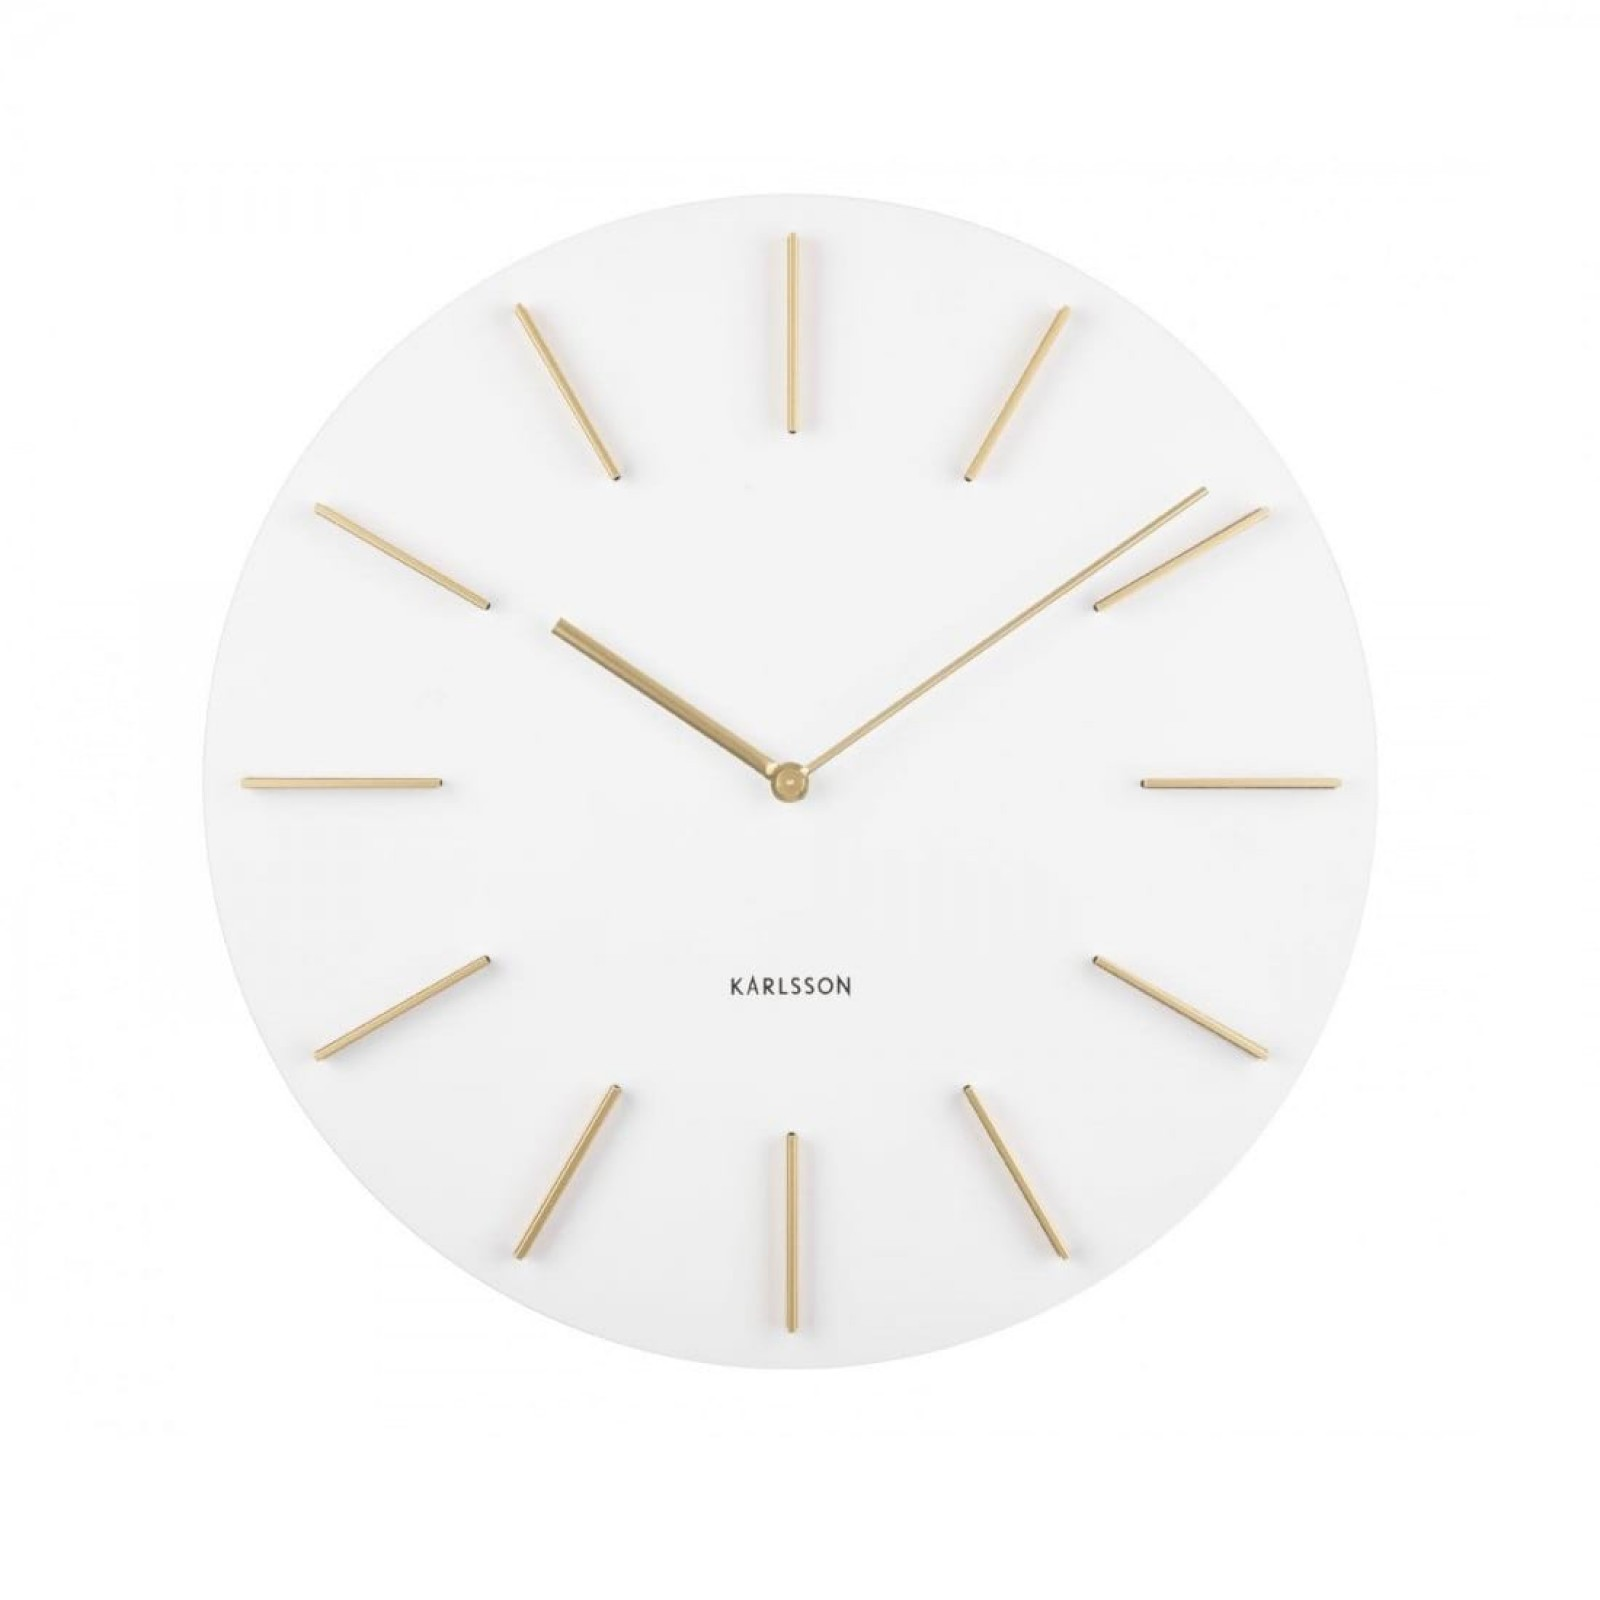 Discreet Wall Clock (White) - Karlsson